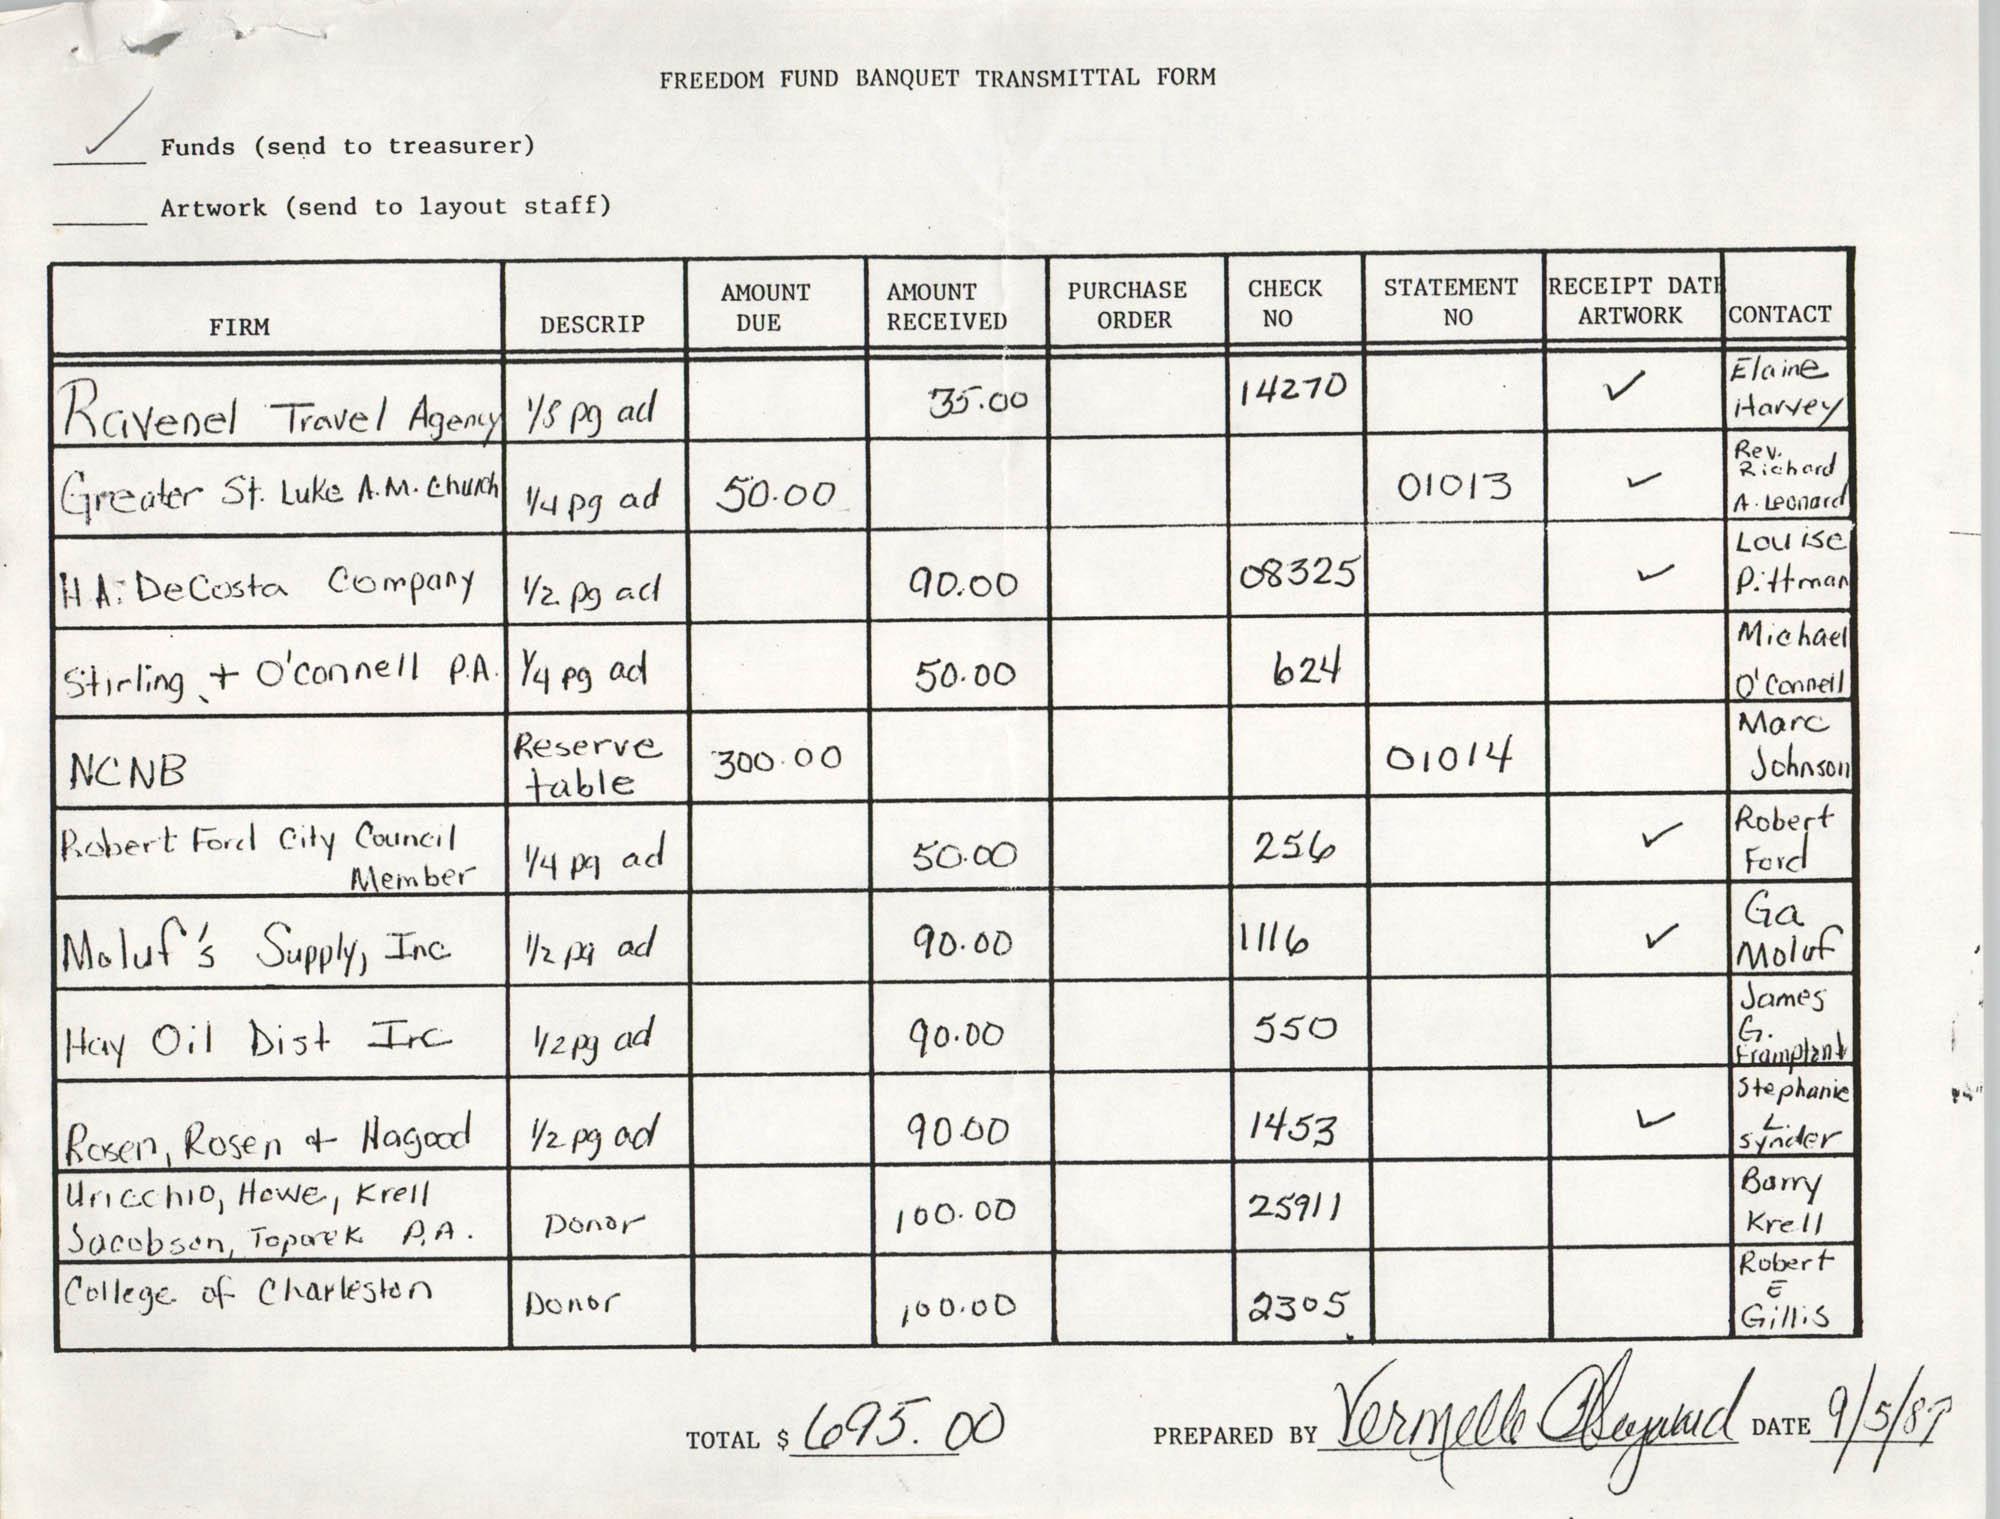 Freedom Fund Banquet Transmittal Forms, 1987